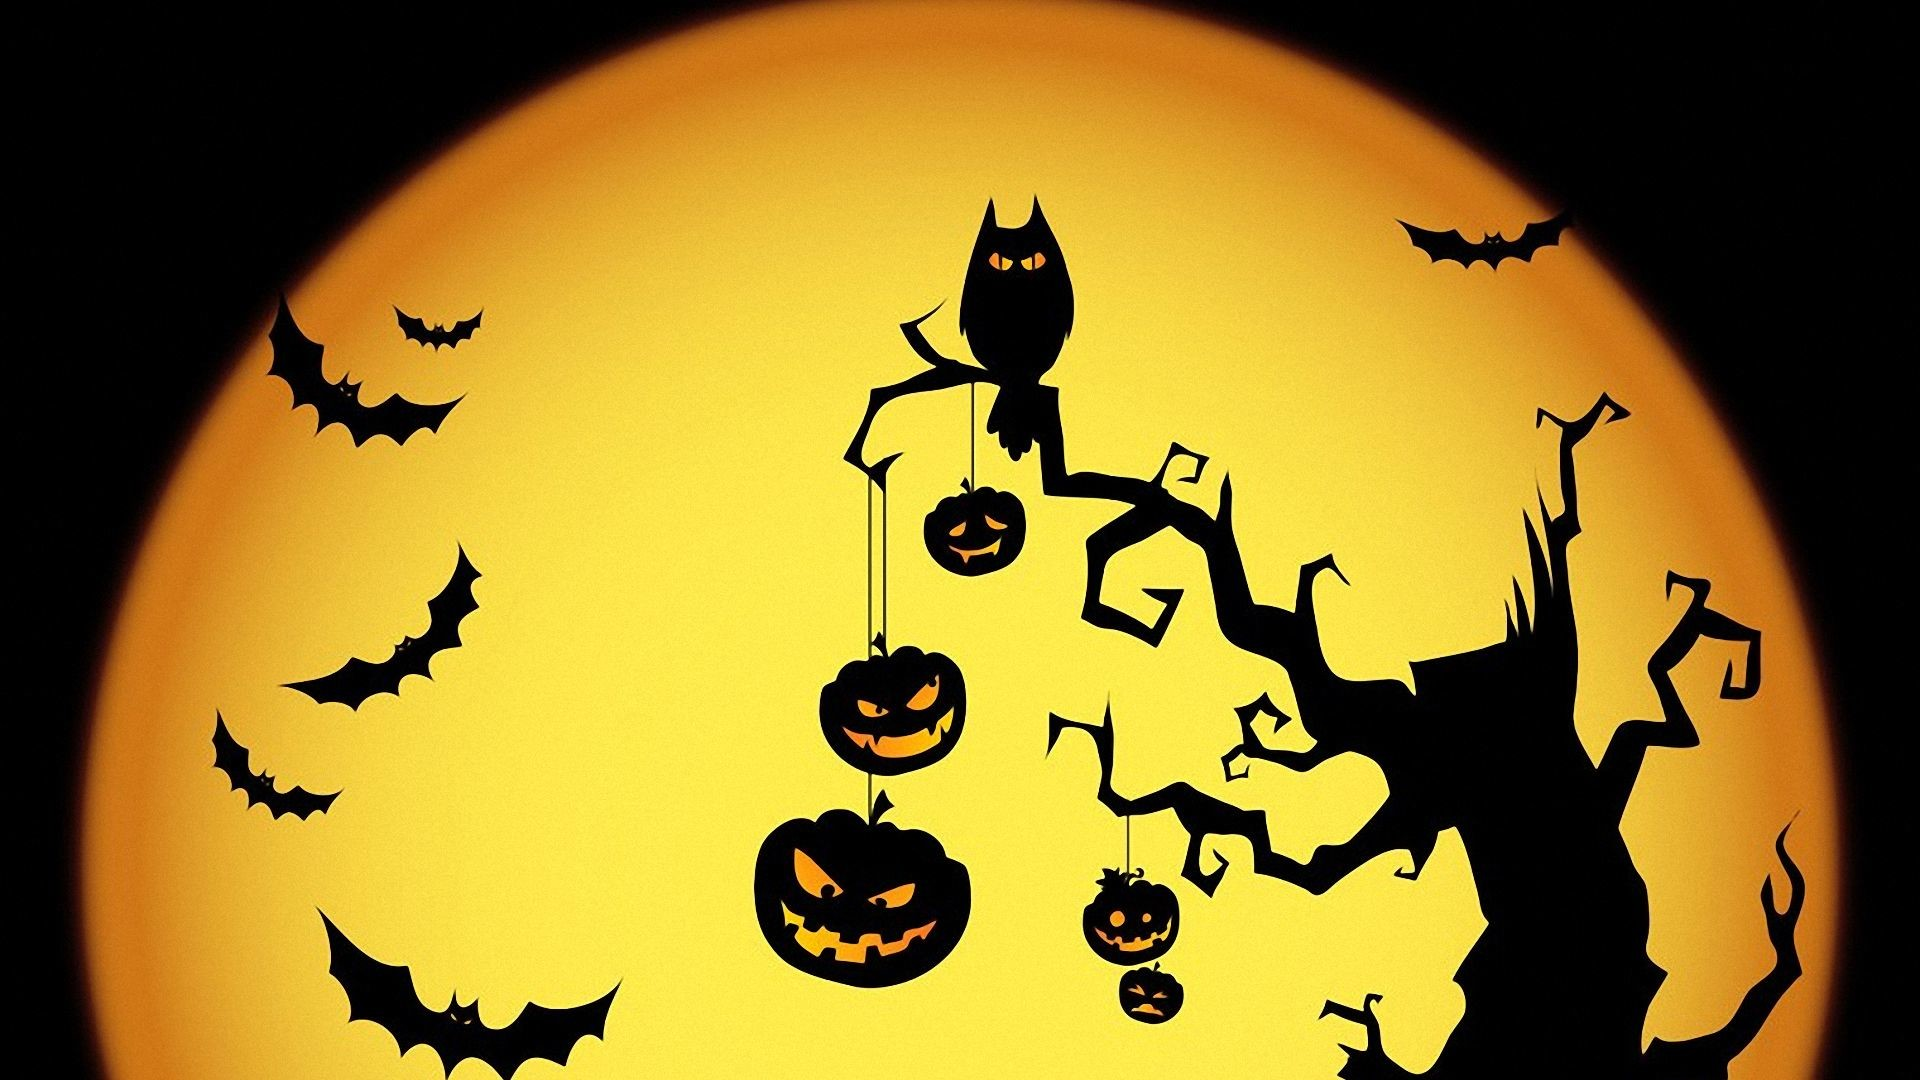 Res: 1920x1080, Halloween Wallpapers Photo